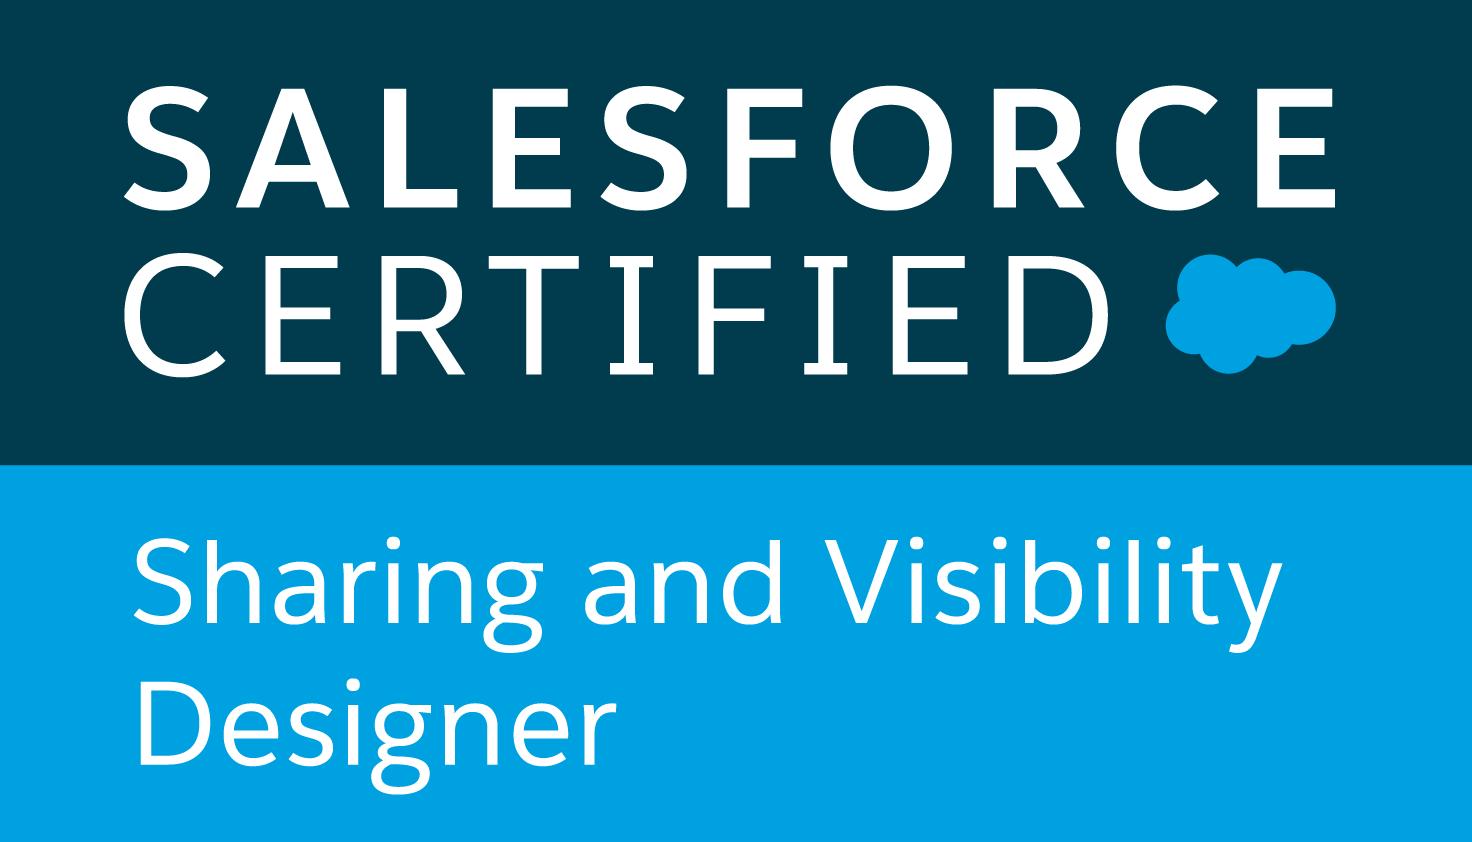 Sharing and Visibility Designer